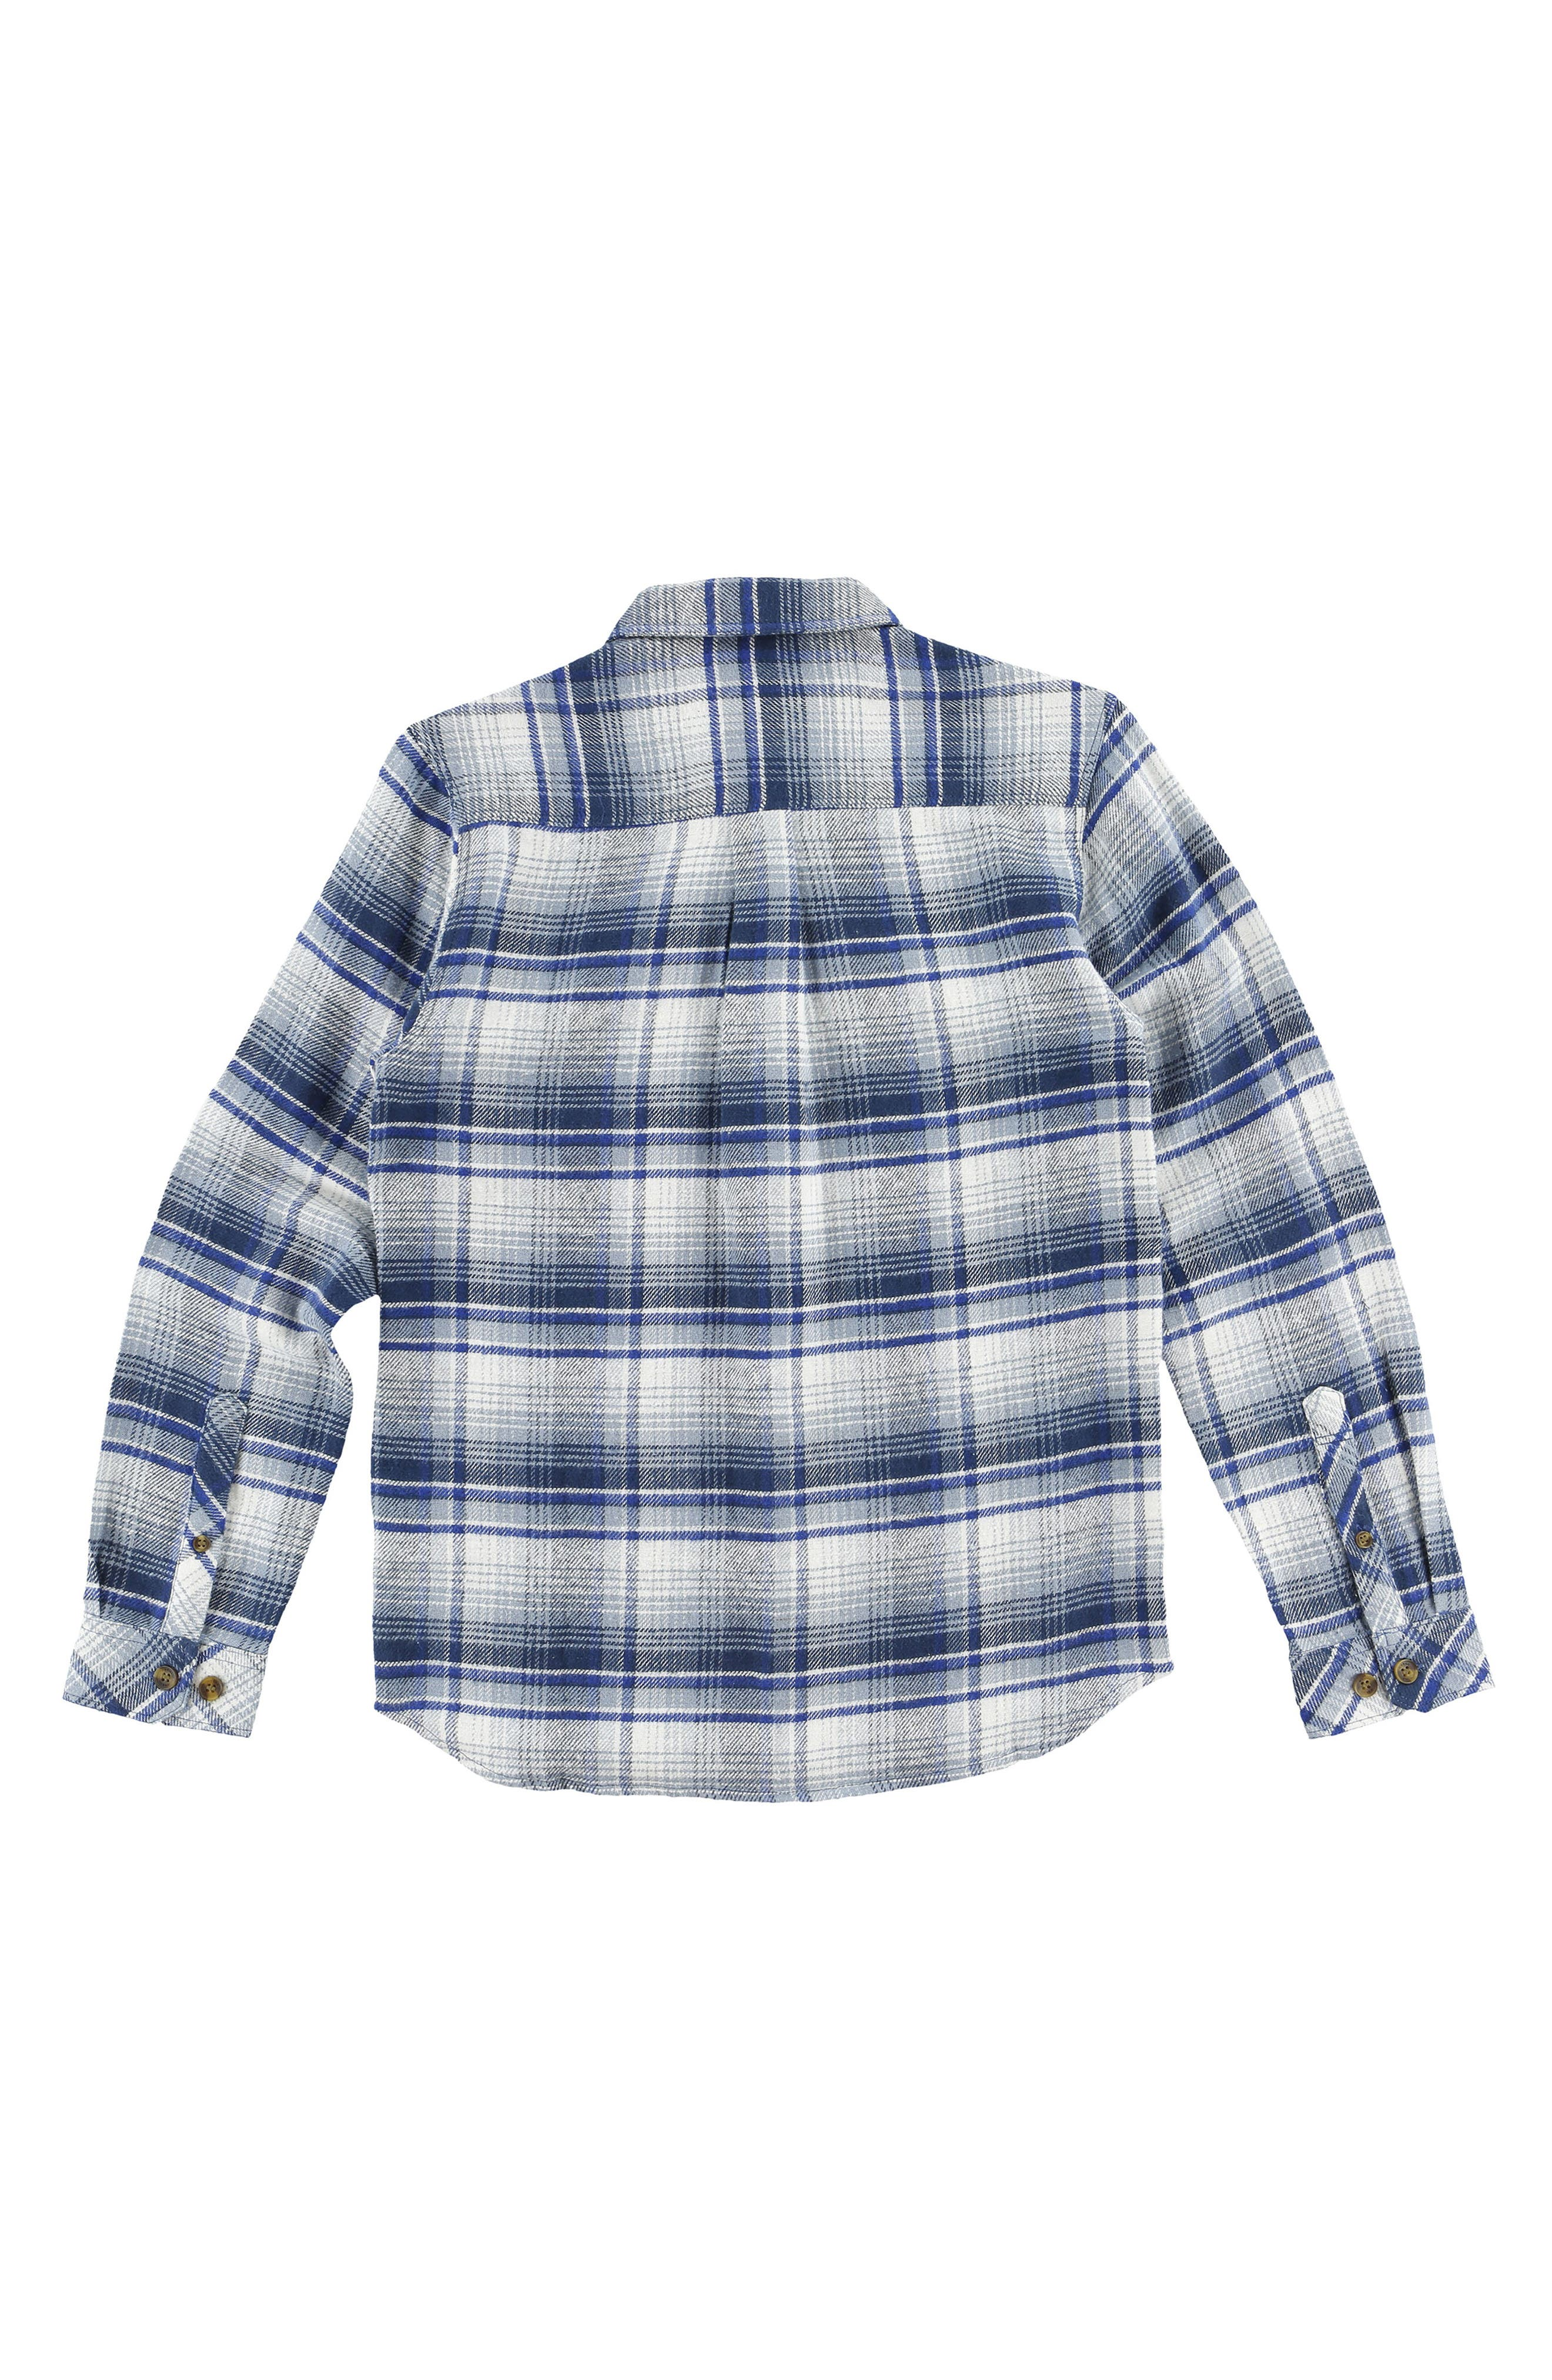 Butler Plaid Flannel Shirt,                             Main thumbnail 1, color,                             472